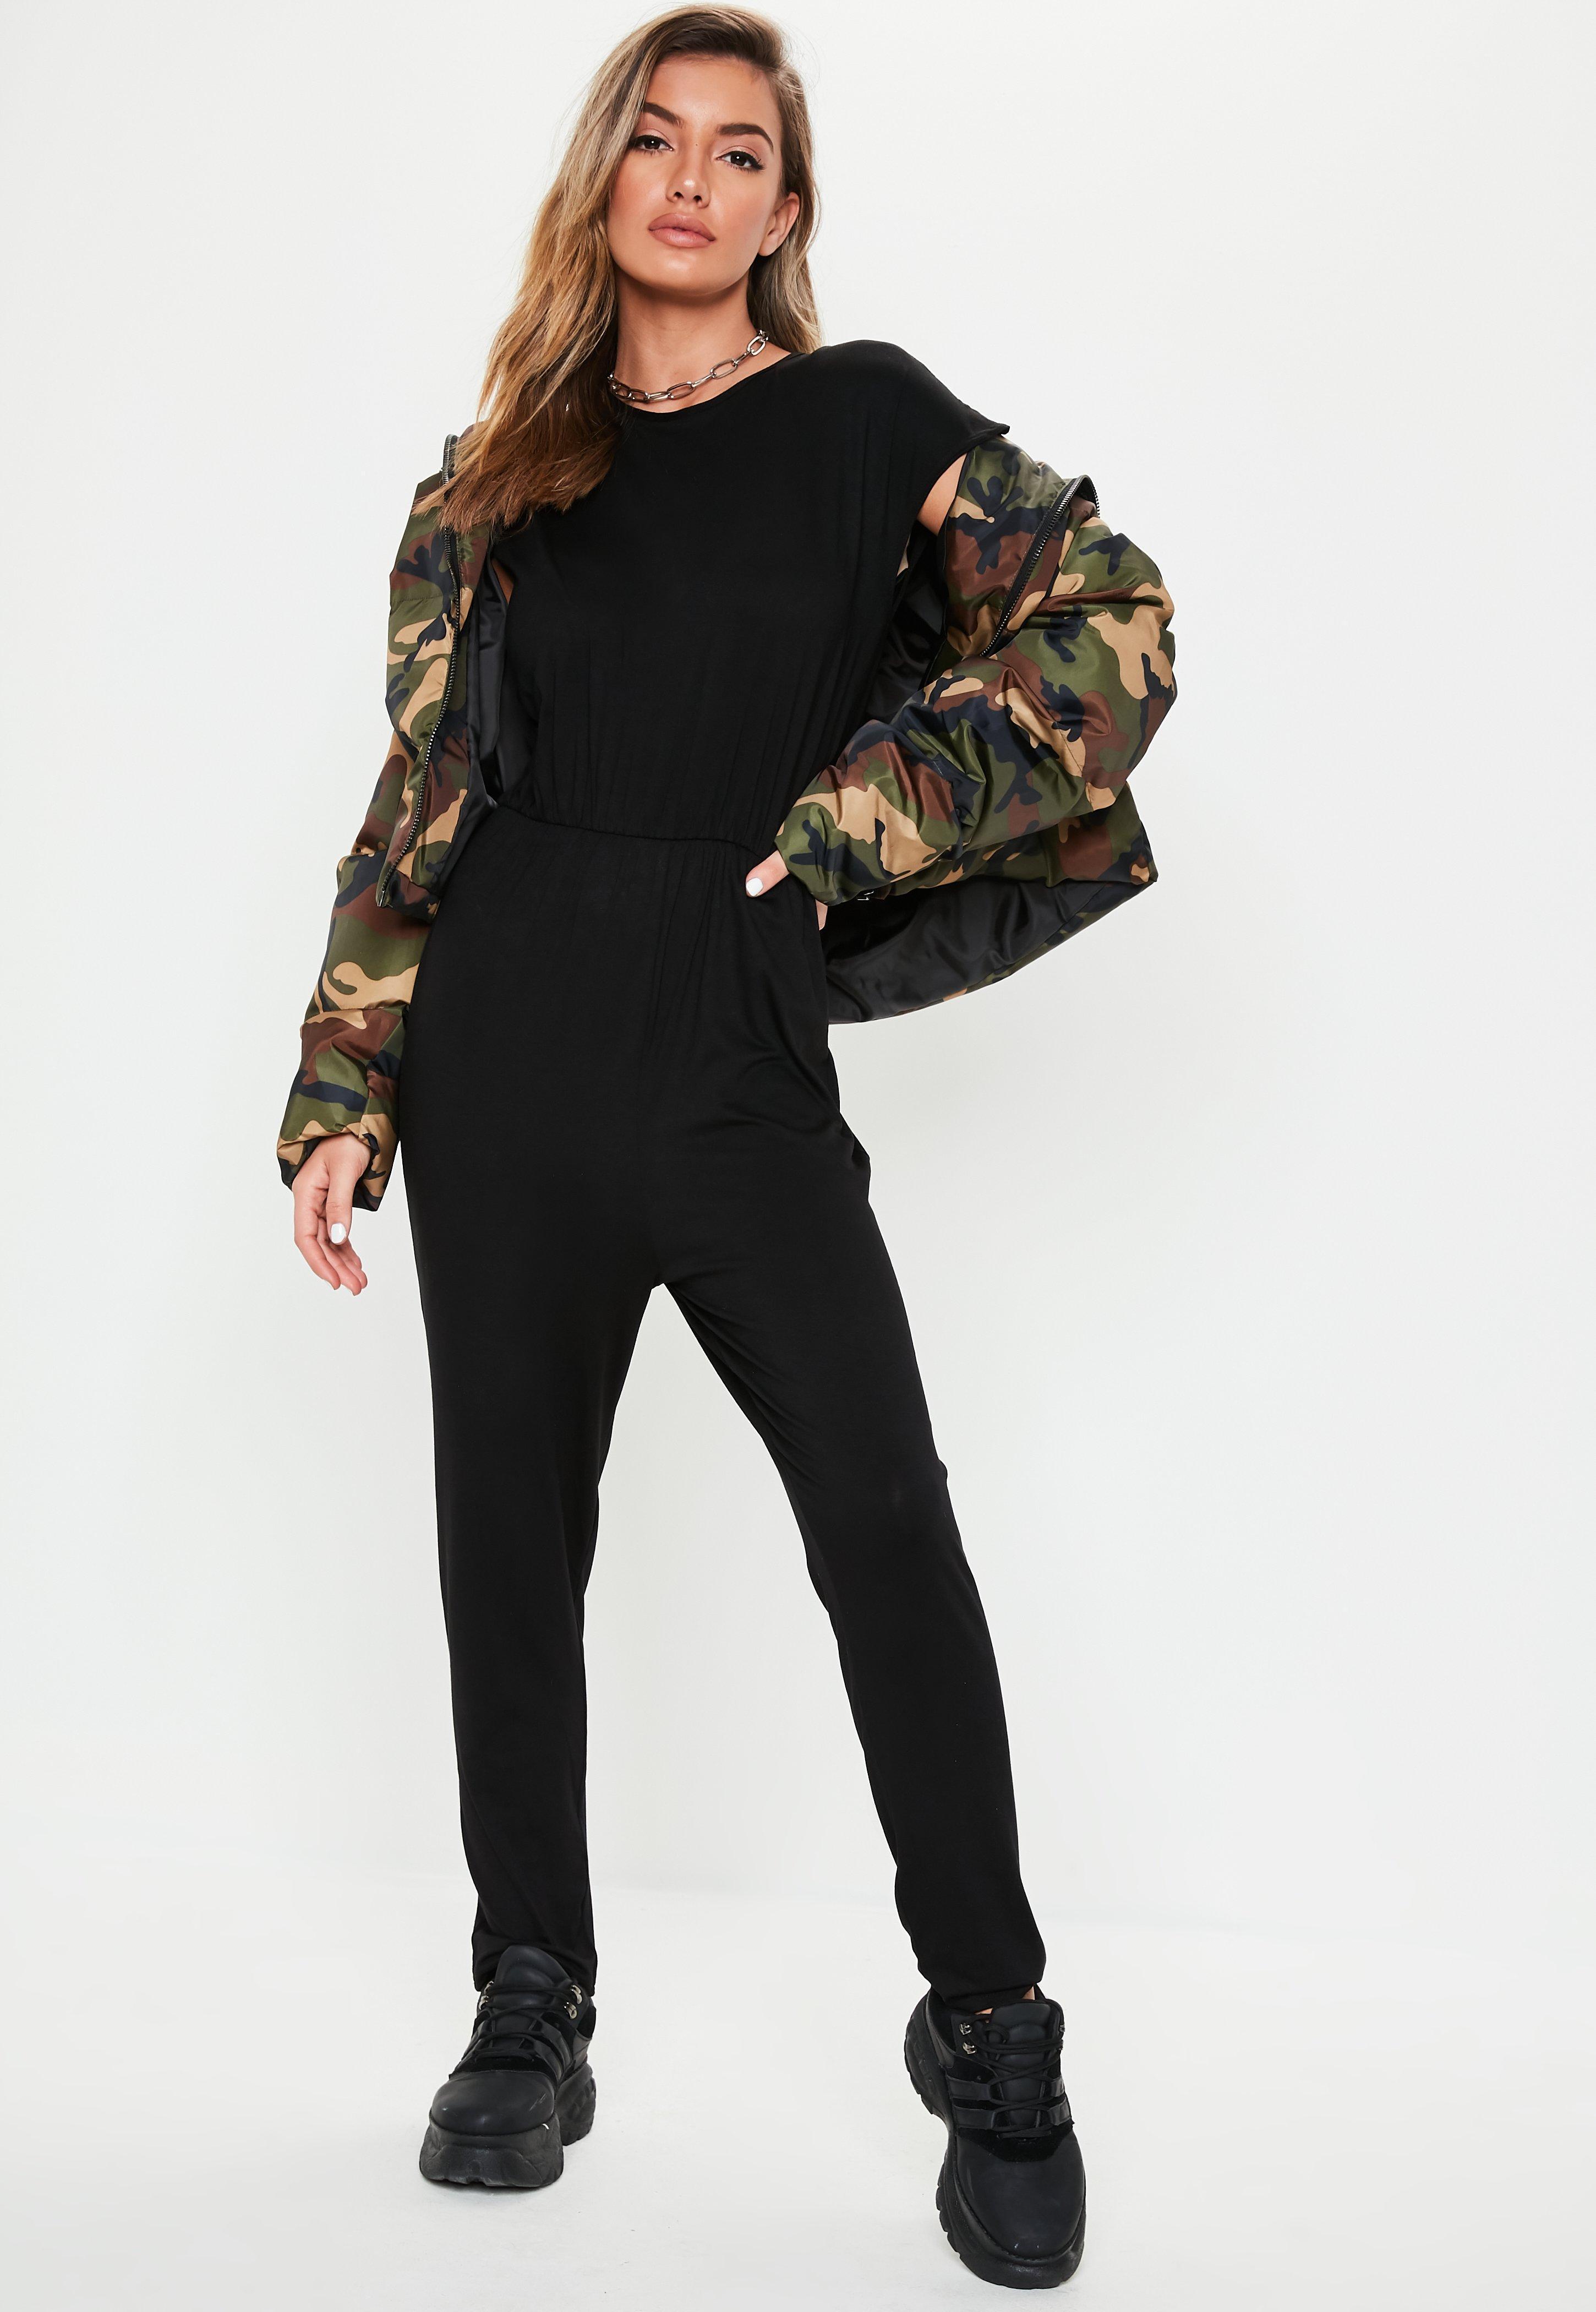 c7f5ed4e8f3 Missguided - Black Cap Sleeve Jersey Jumpsuit - Lyst. View fullscreen